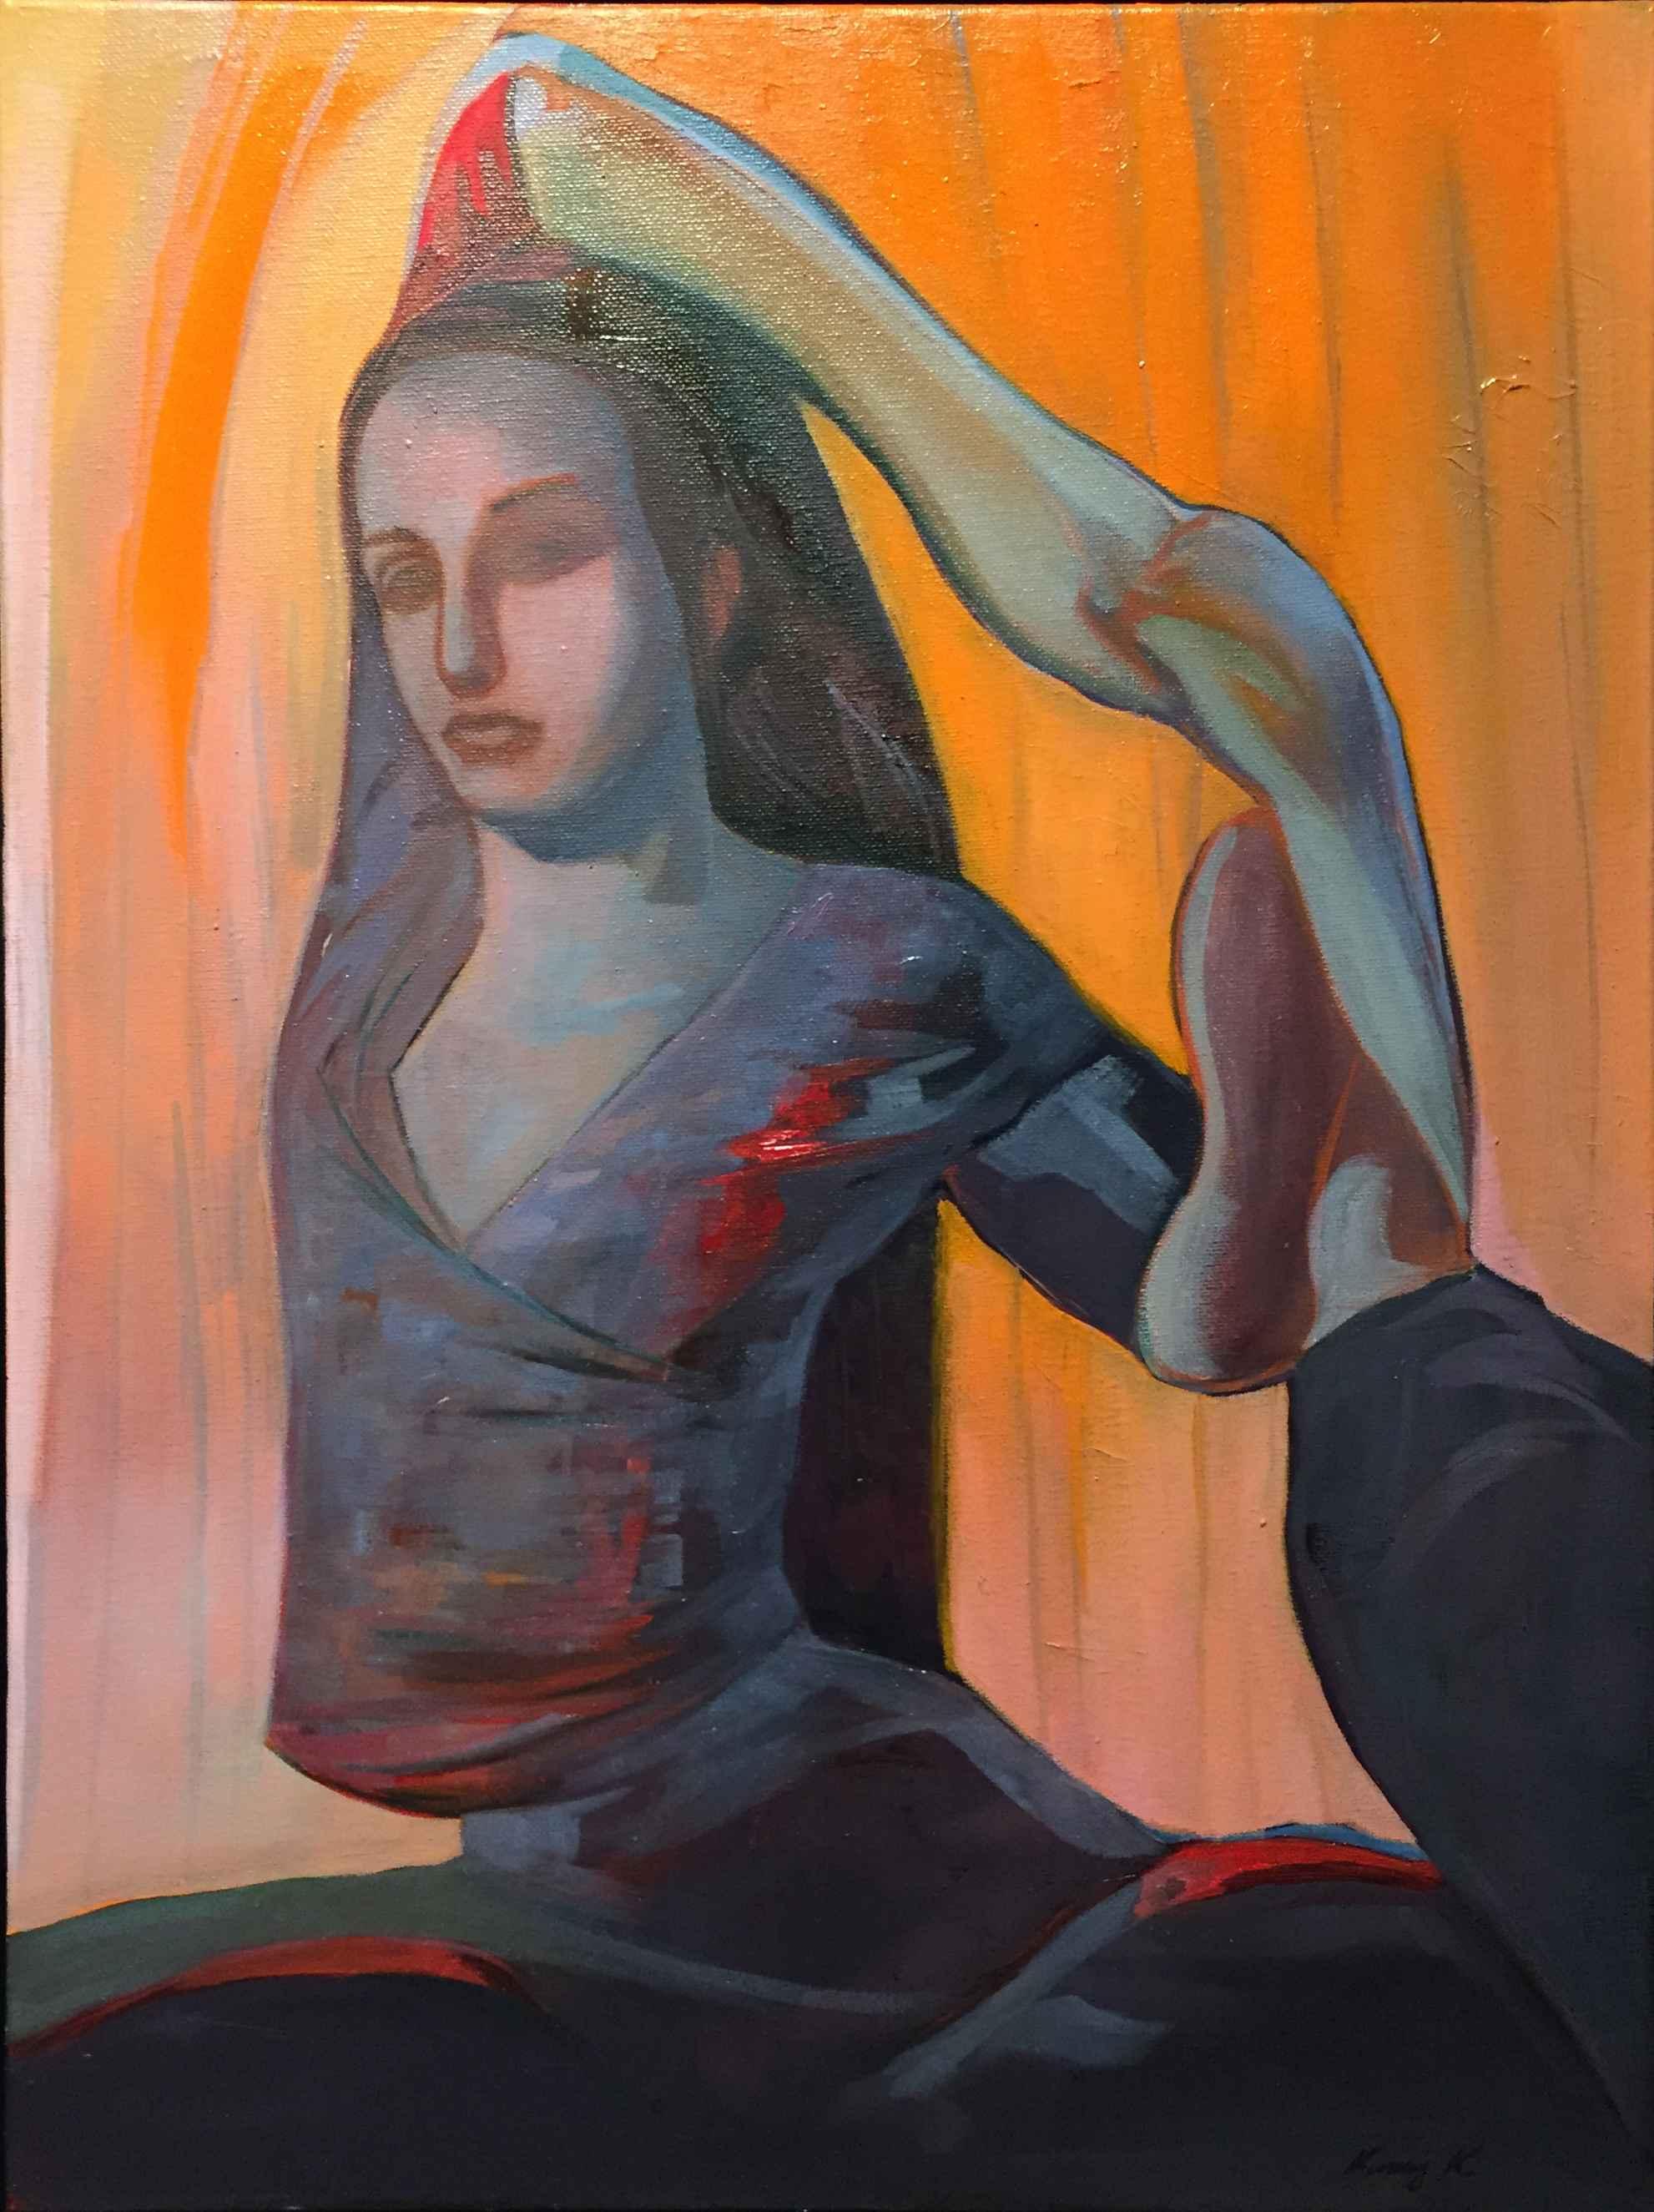 Yoga Study #6 by  Vinny K - Masterpiece Online